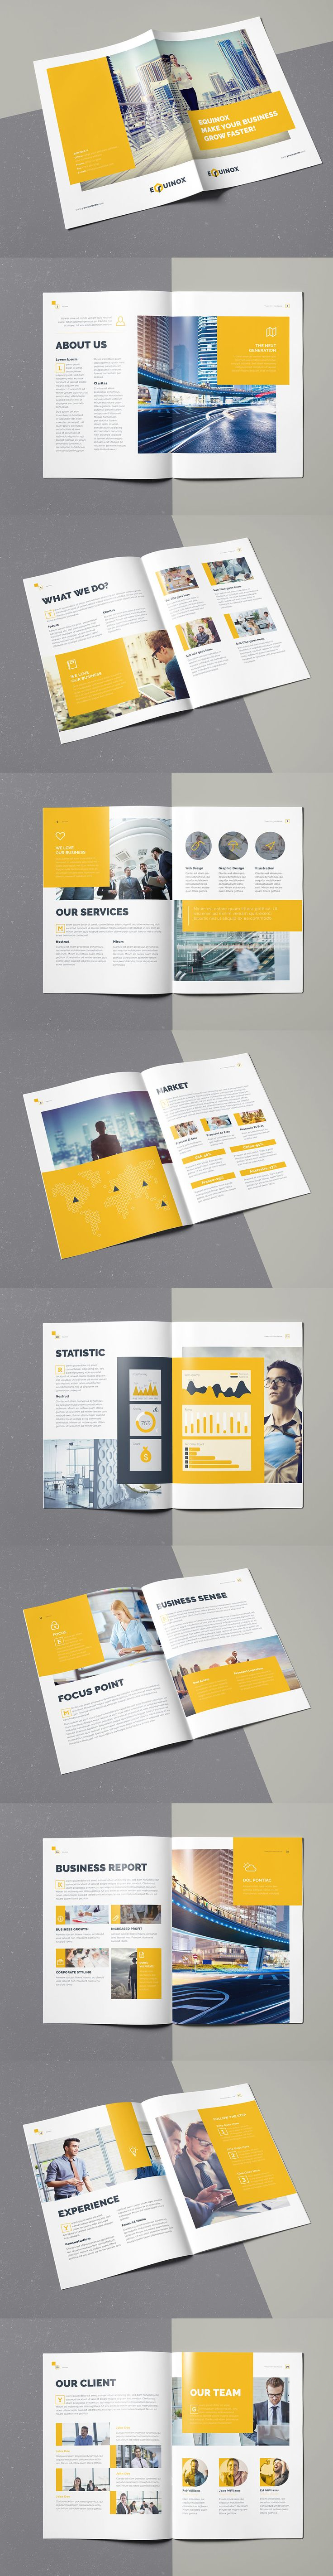 Corporate Brochure Template INDD